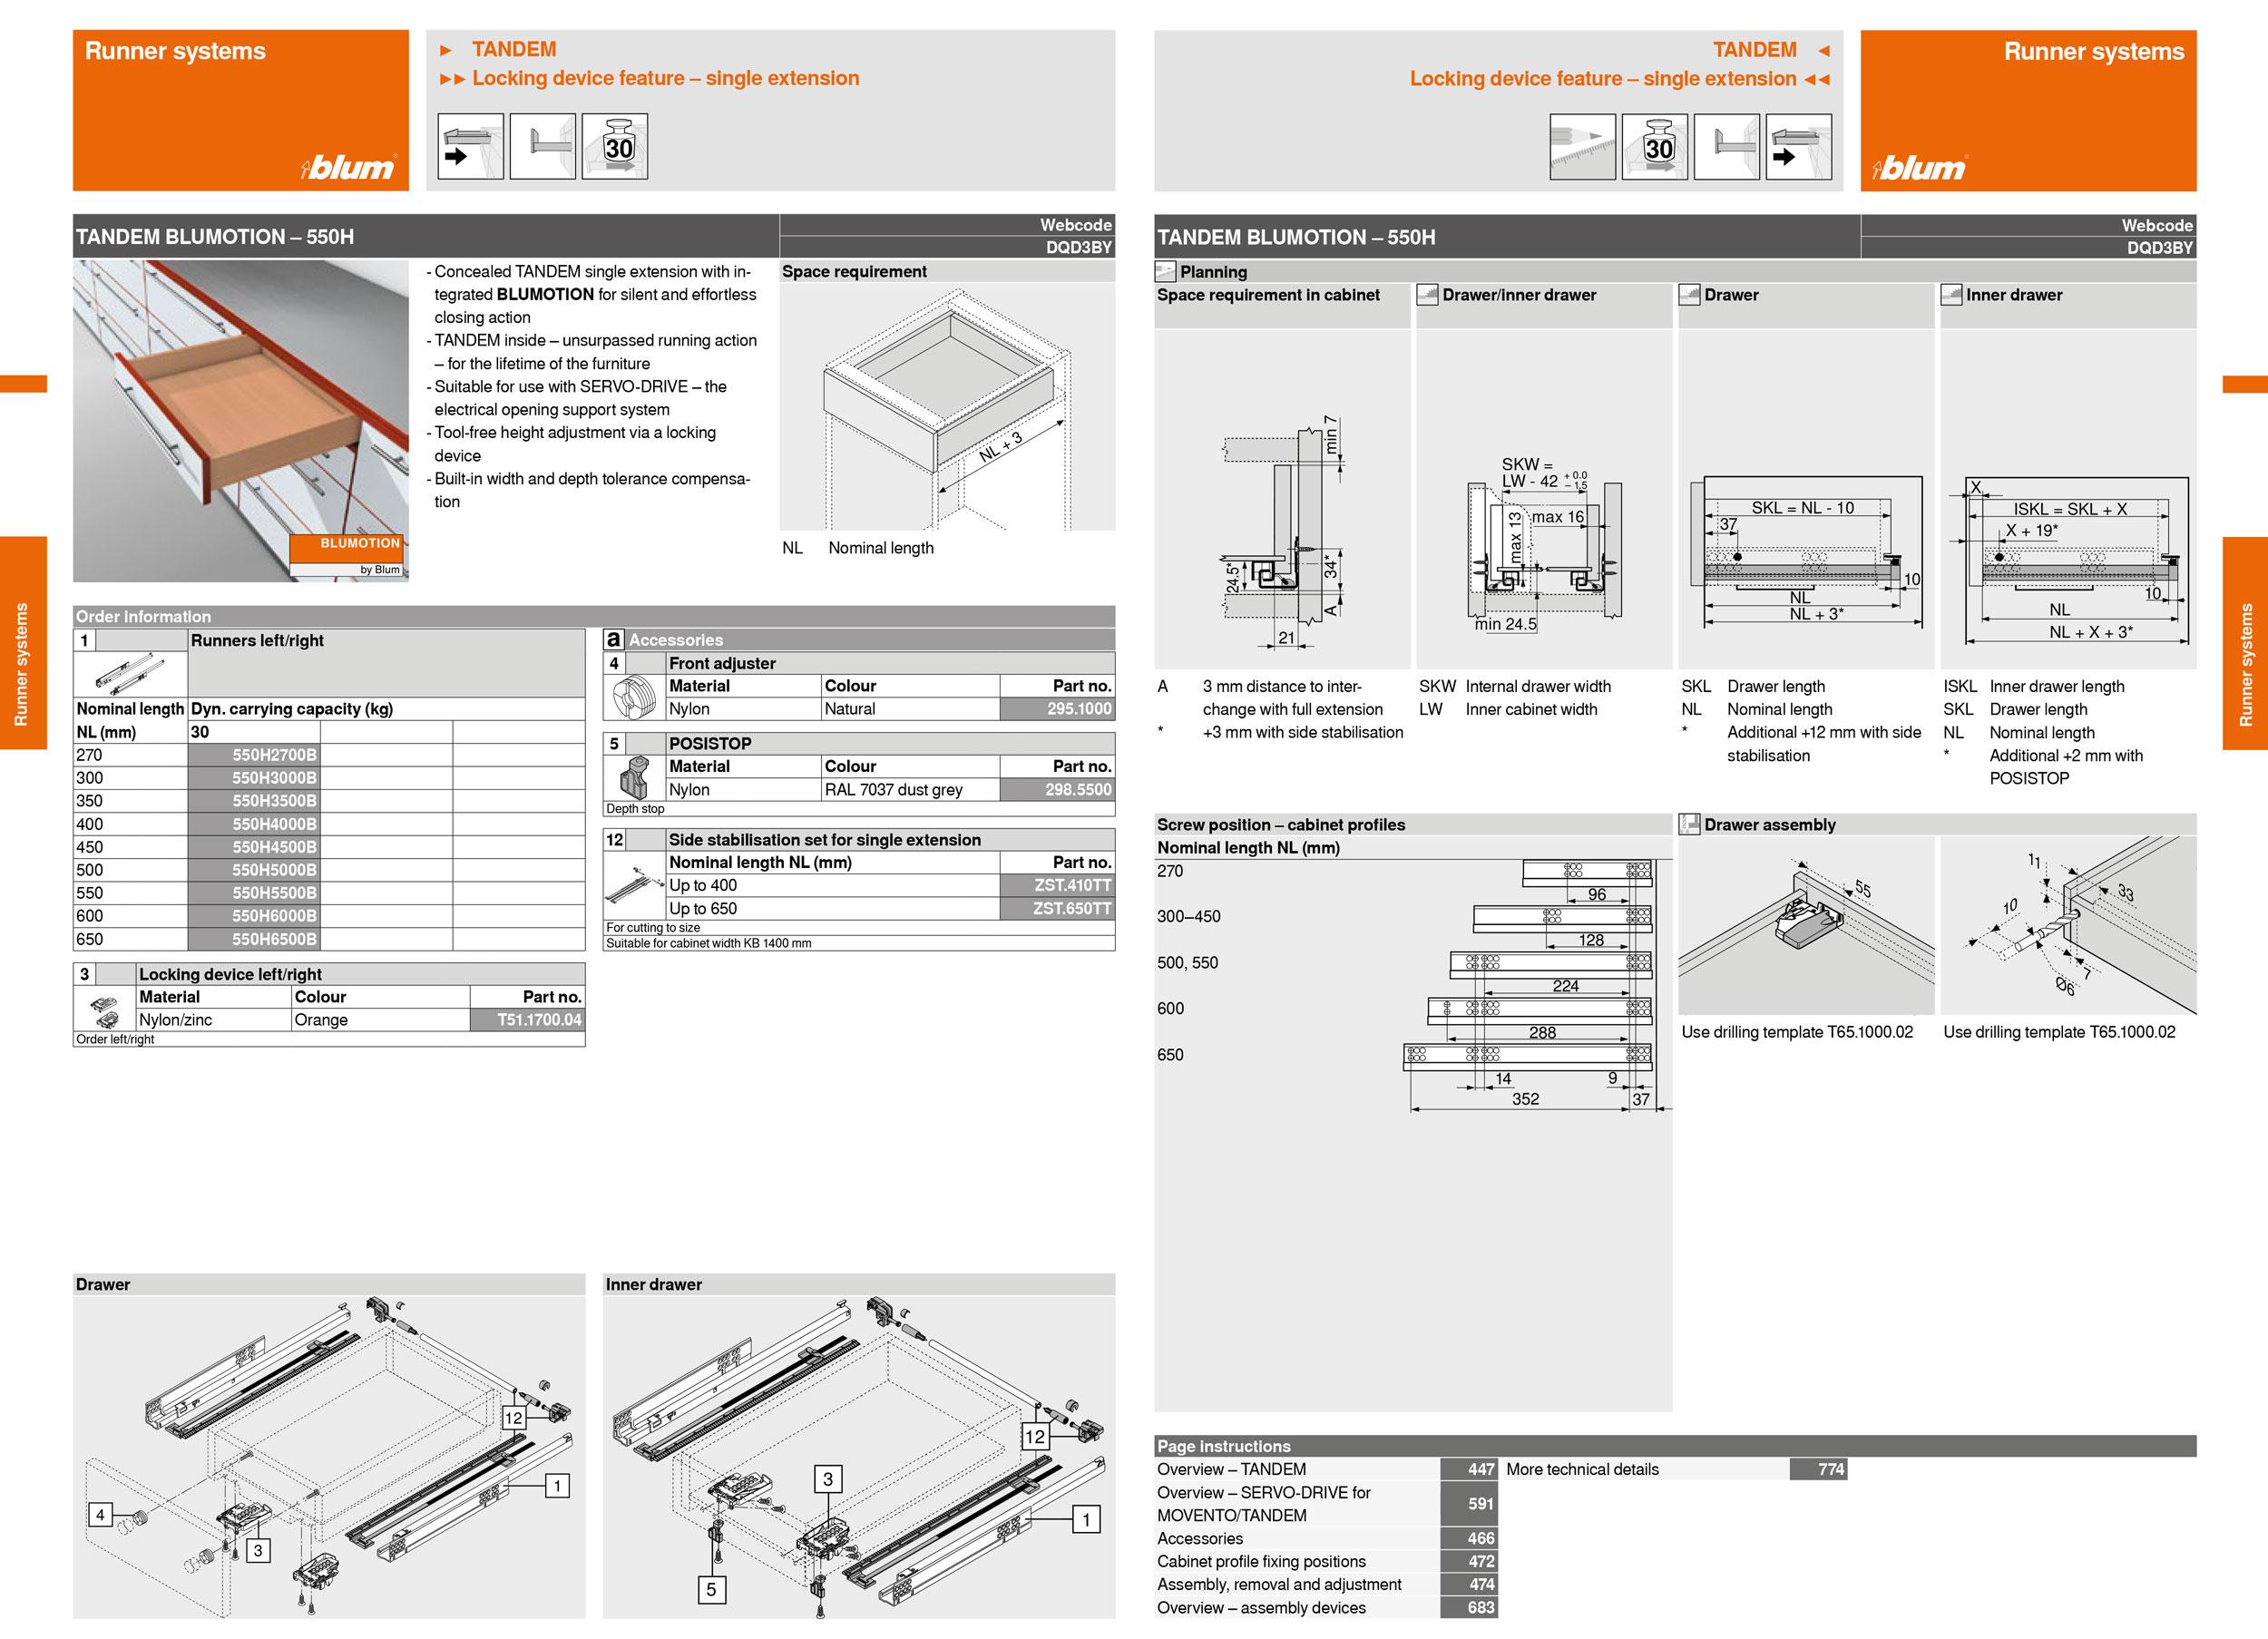 hettich drawer fitting instructions